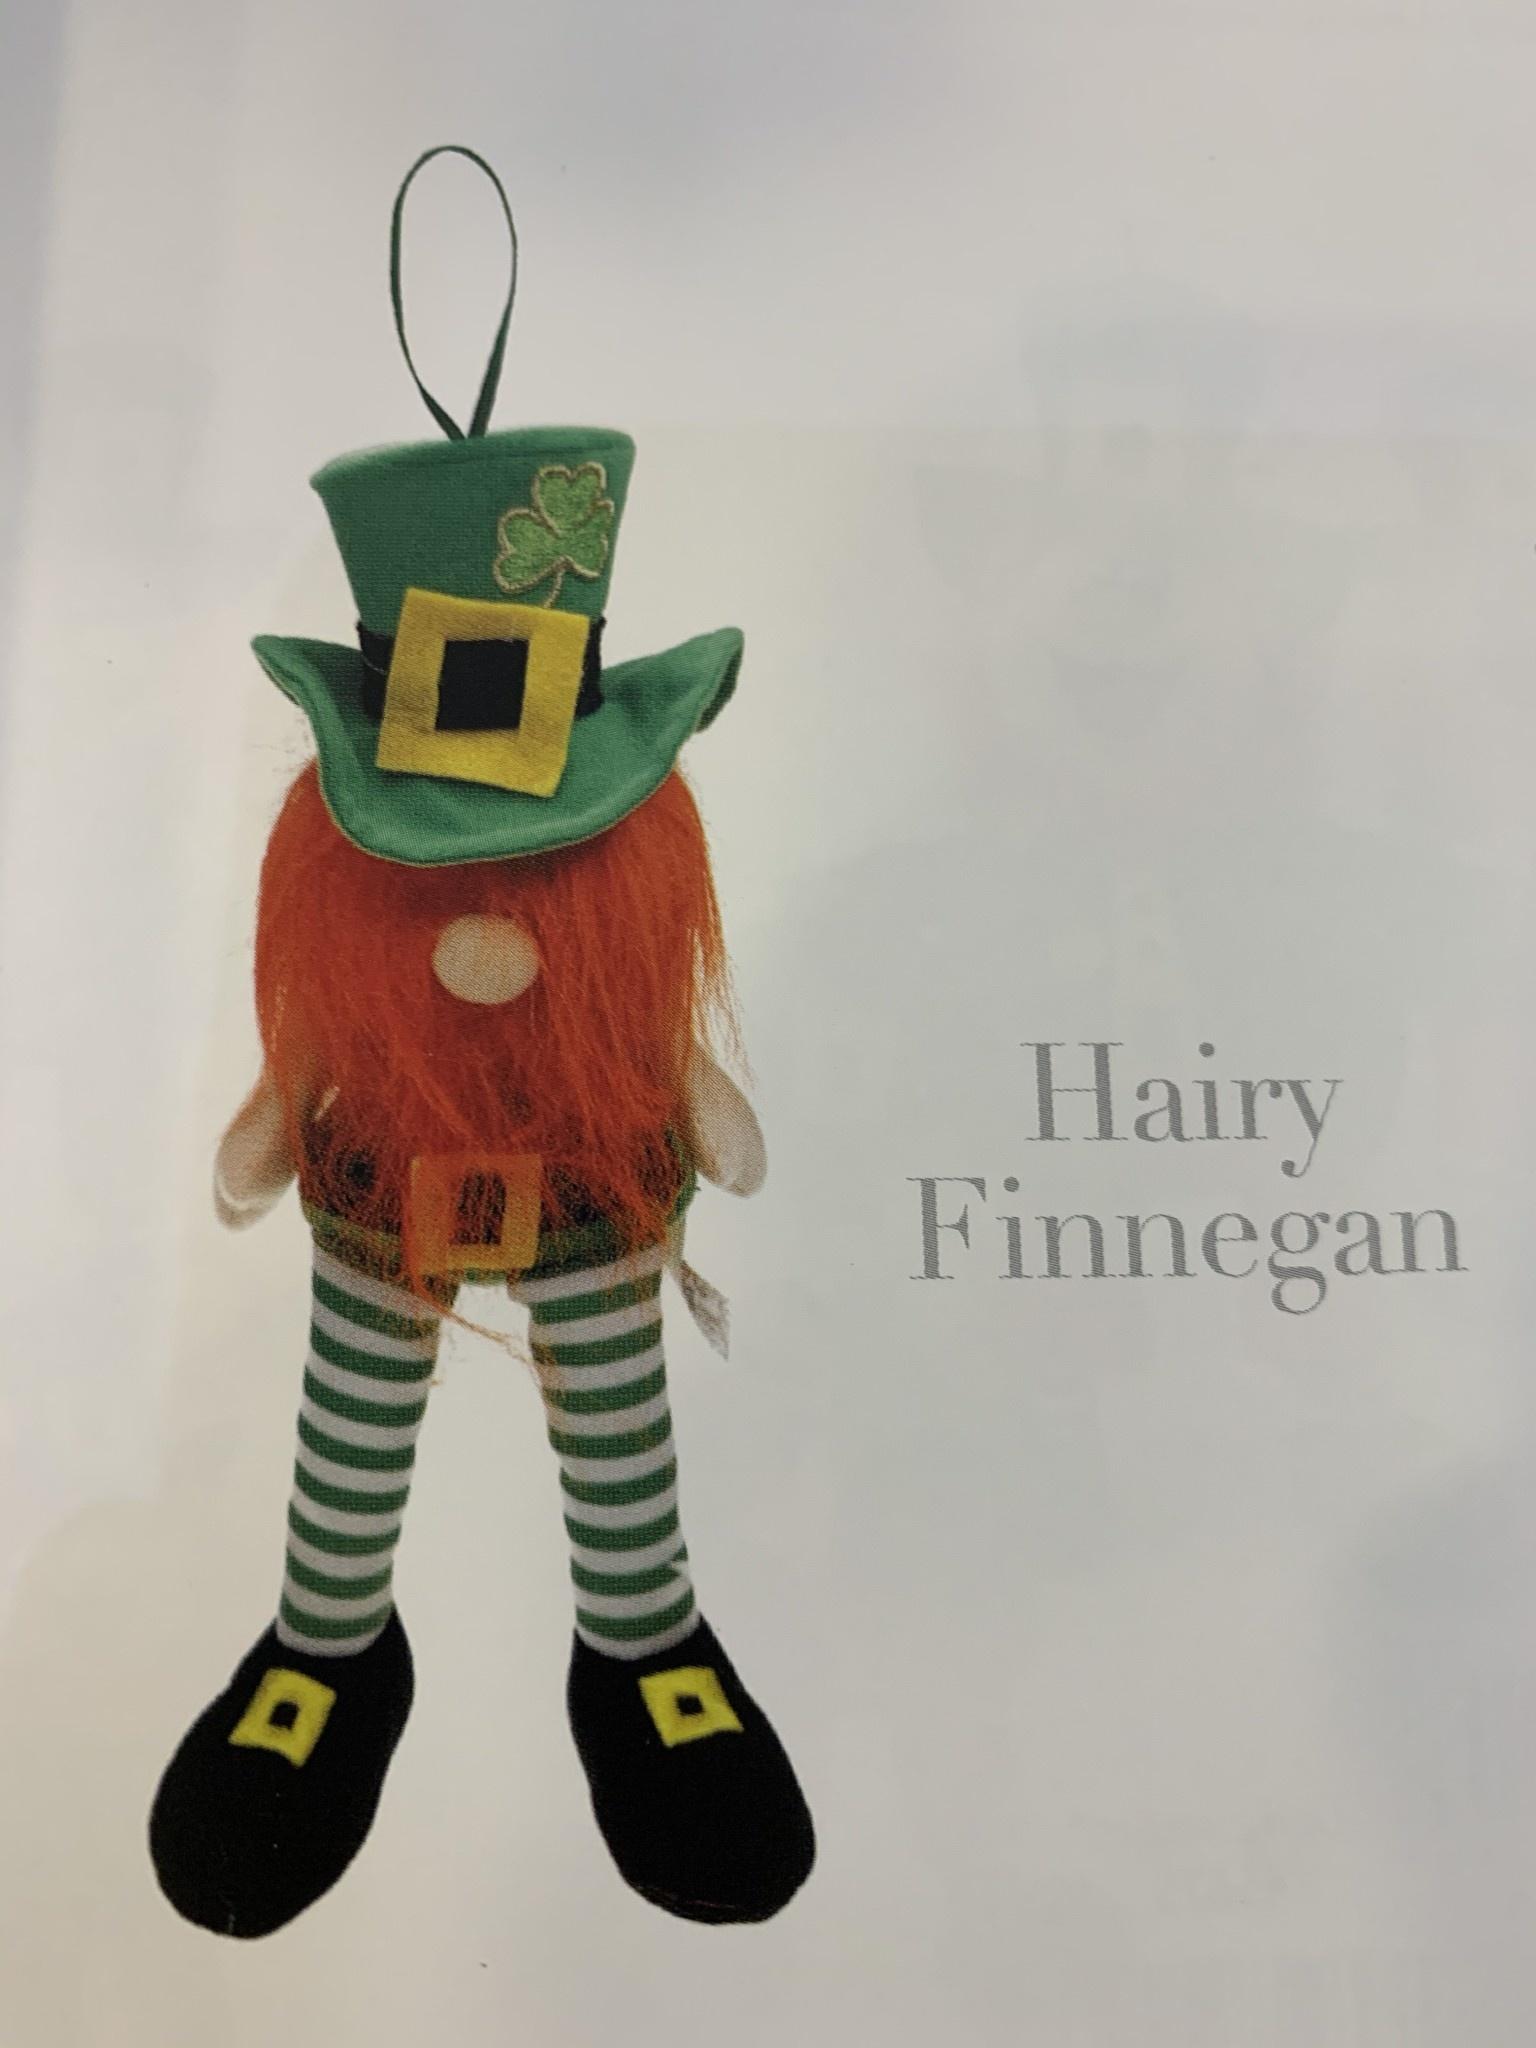 Toy: Hairy Finnegan Small